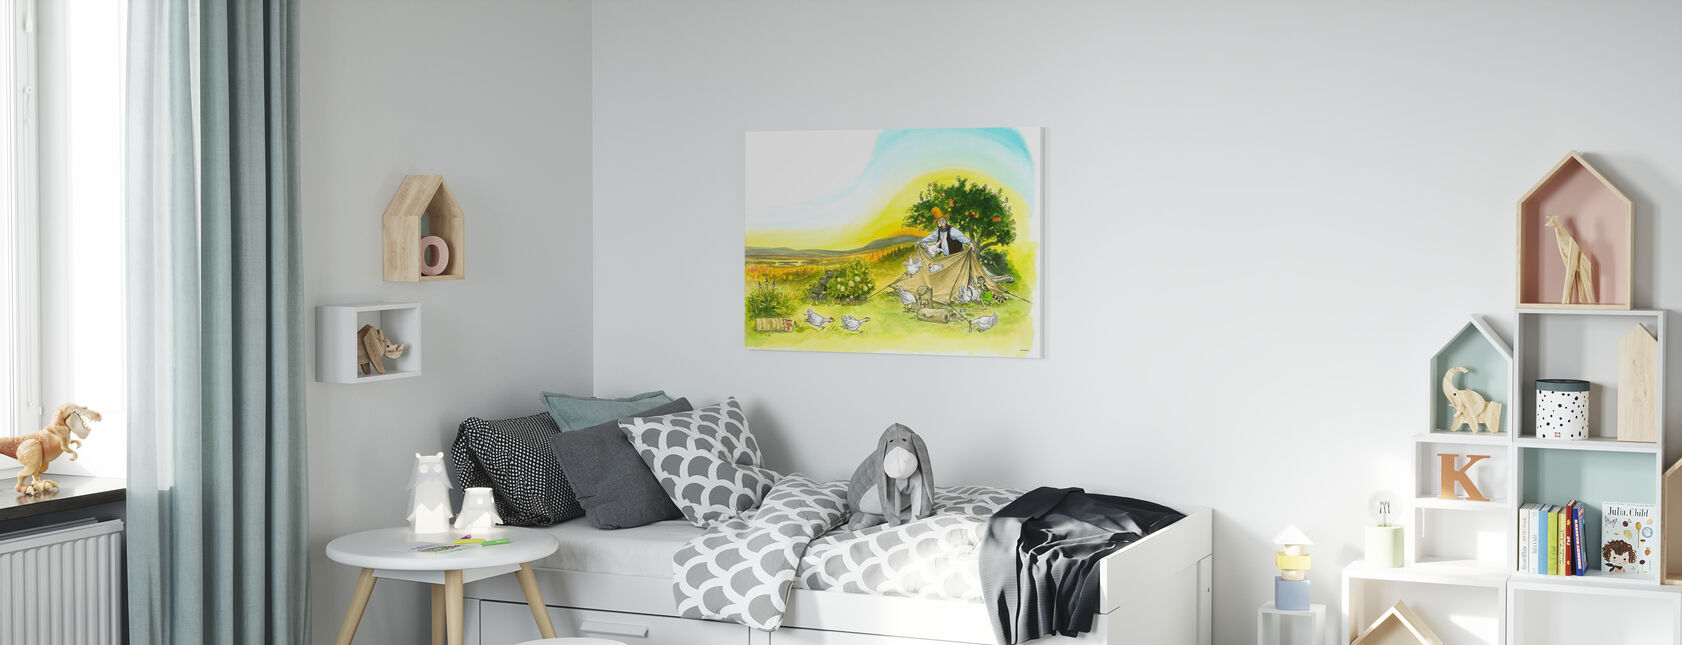 Pettson en Findus - Pettson Tenten 1 - Canvas print - Kinderkamer